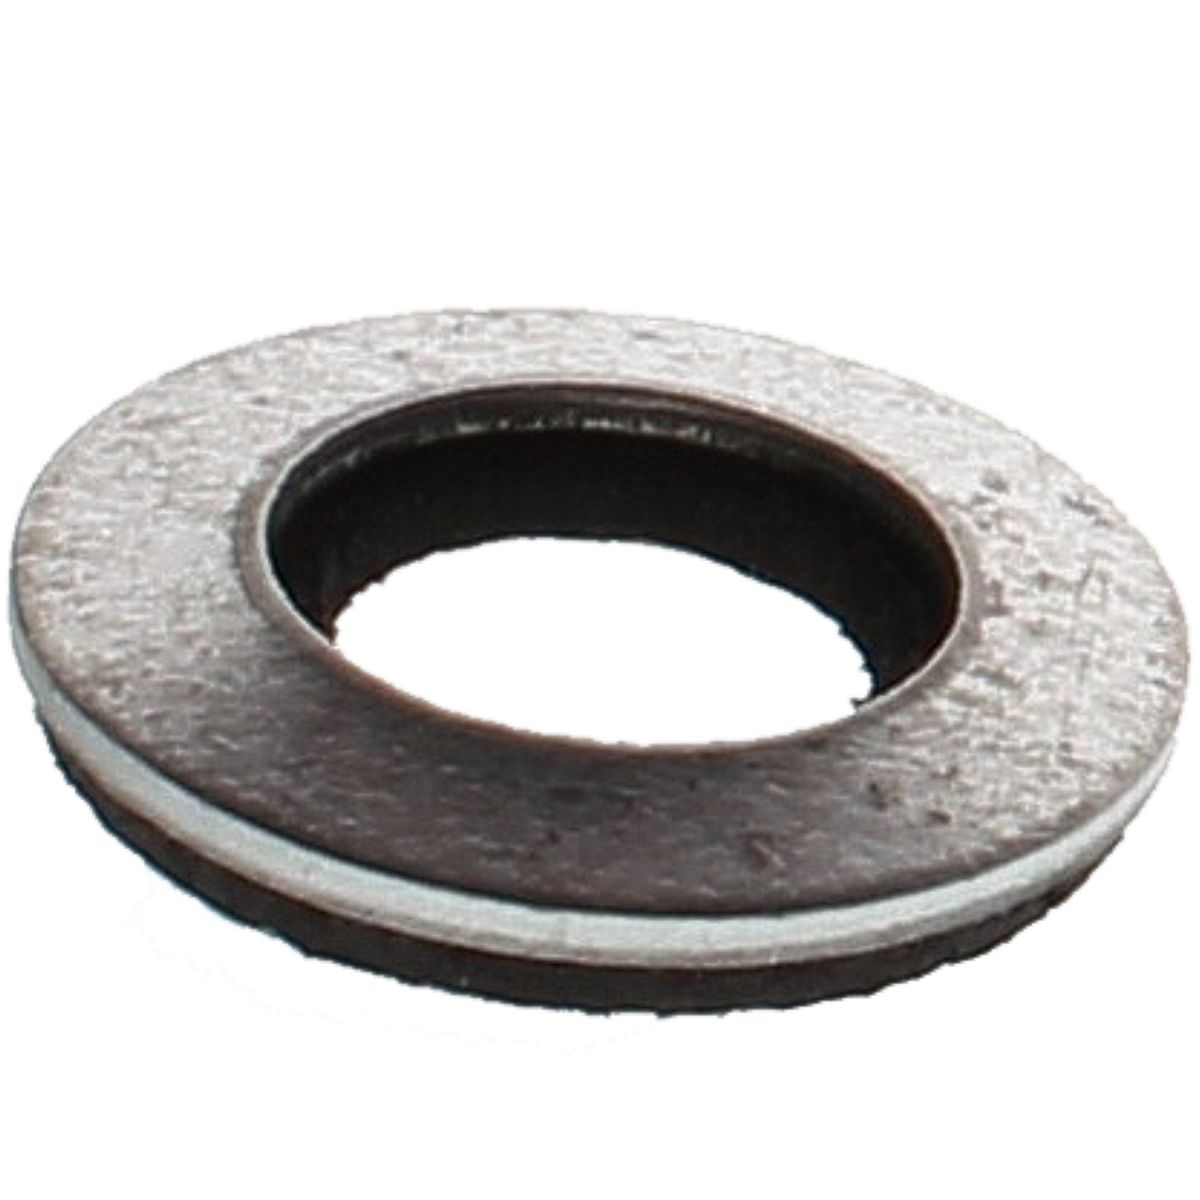 "#10 x 5/8"" Bonded Sealing Washers — Galvanized Steel/EPDM, 100/PKG"